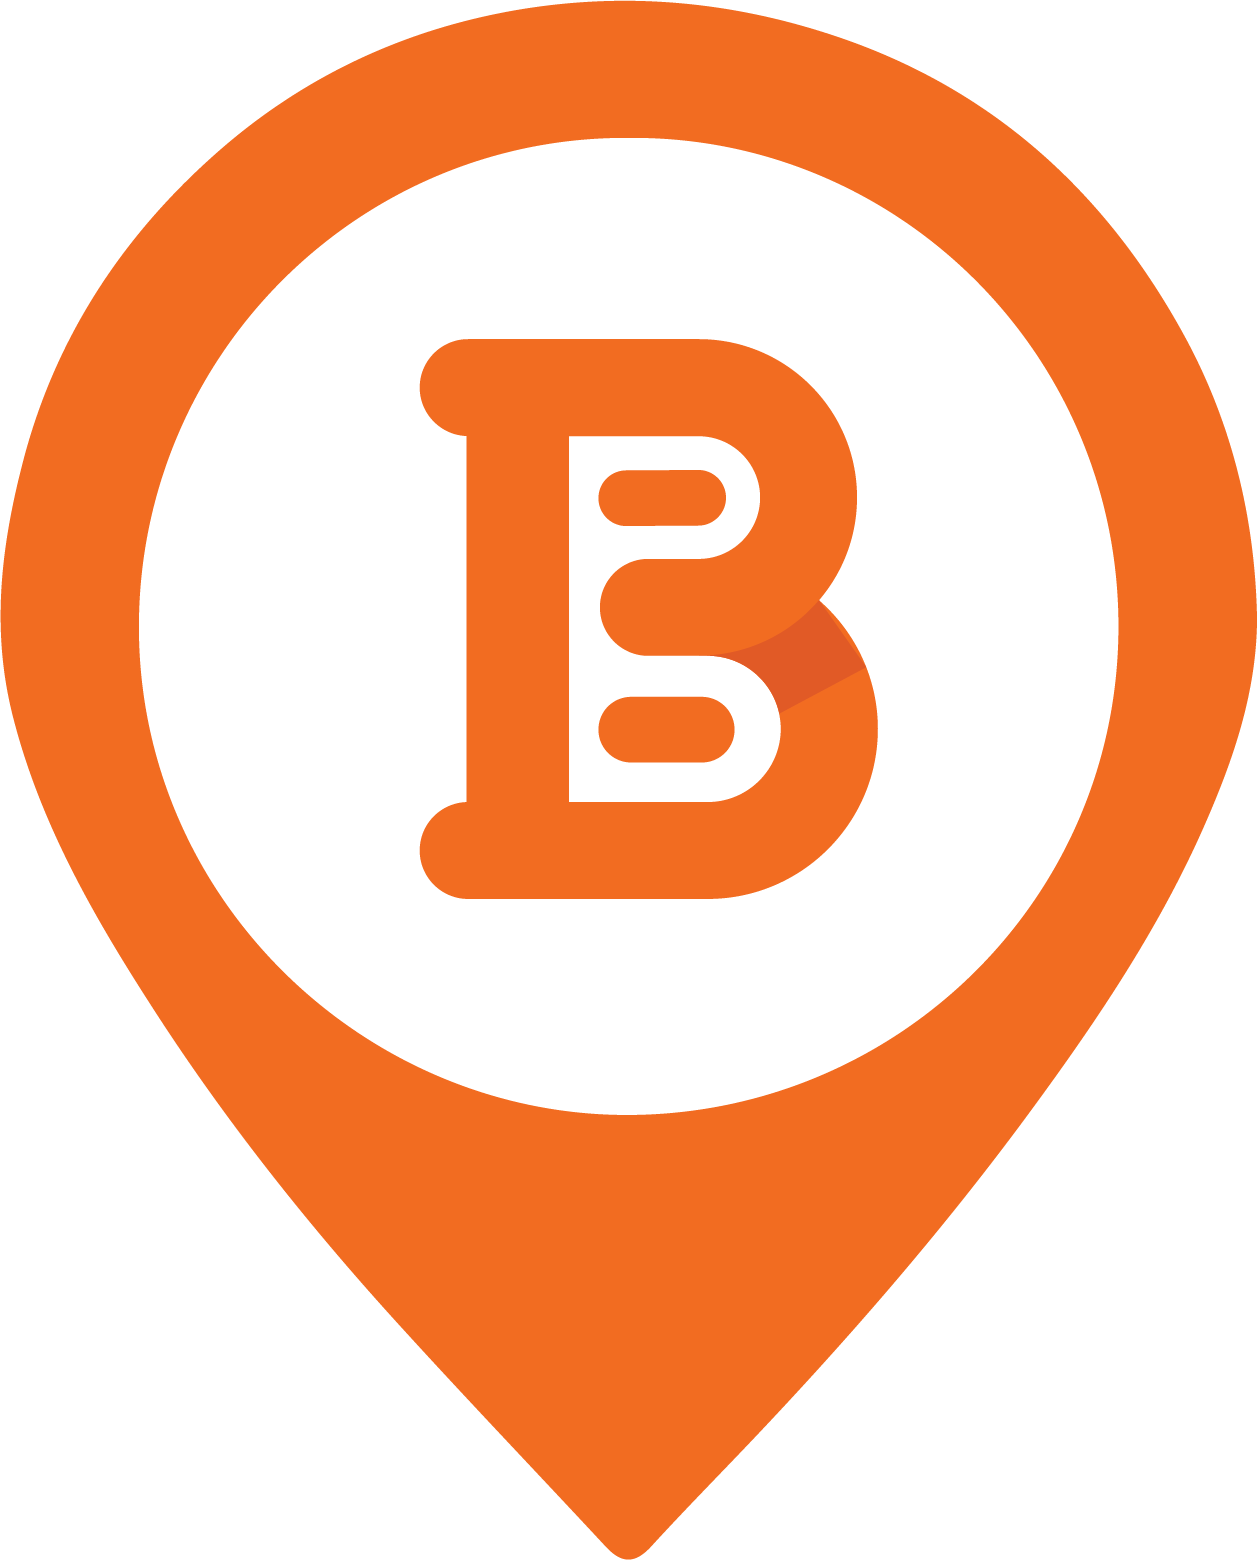 Bleeper bike location icon